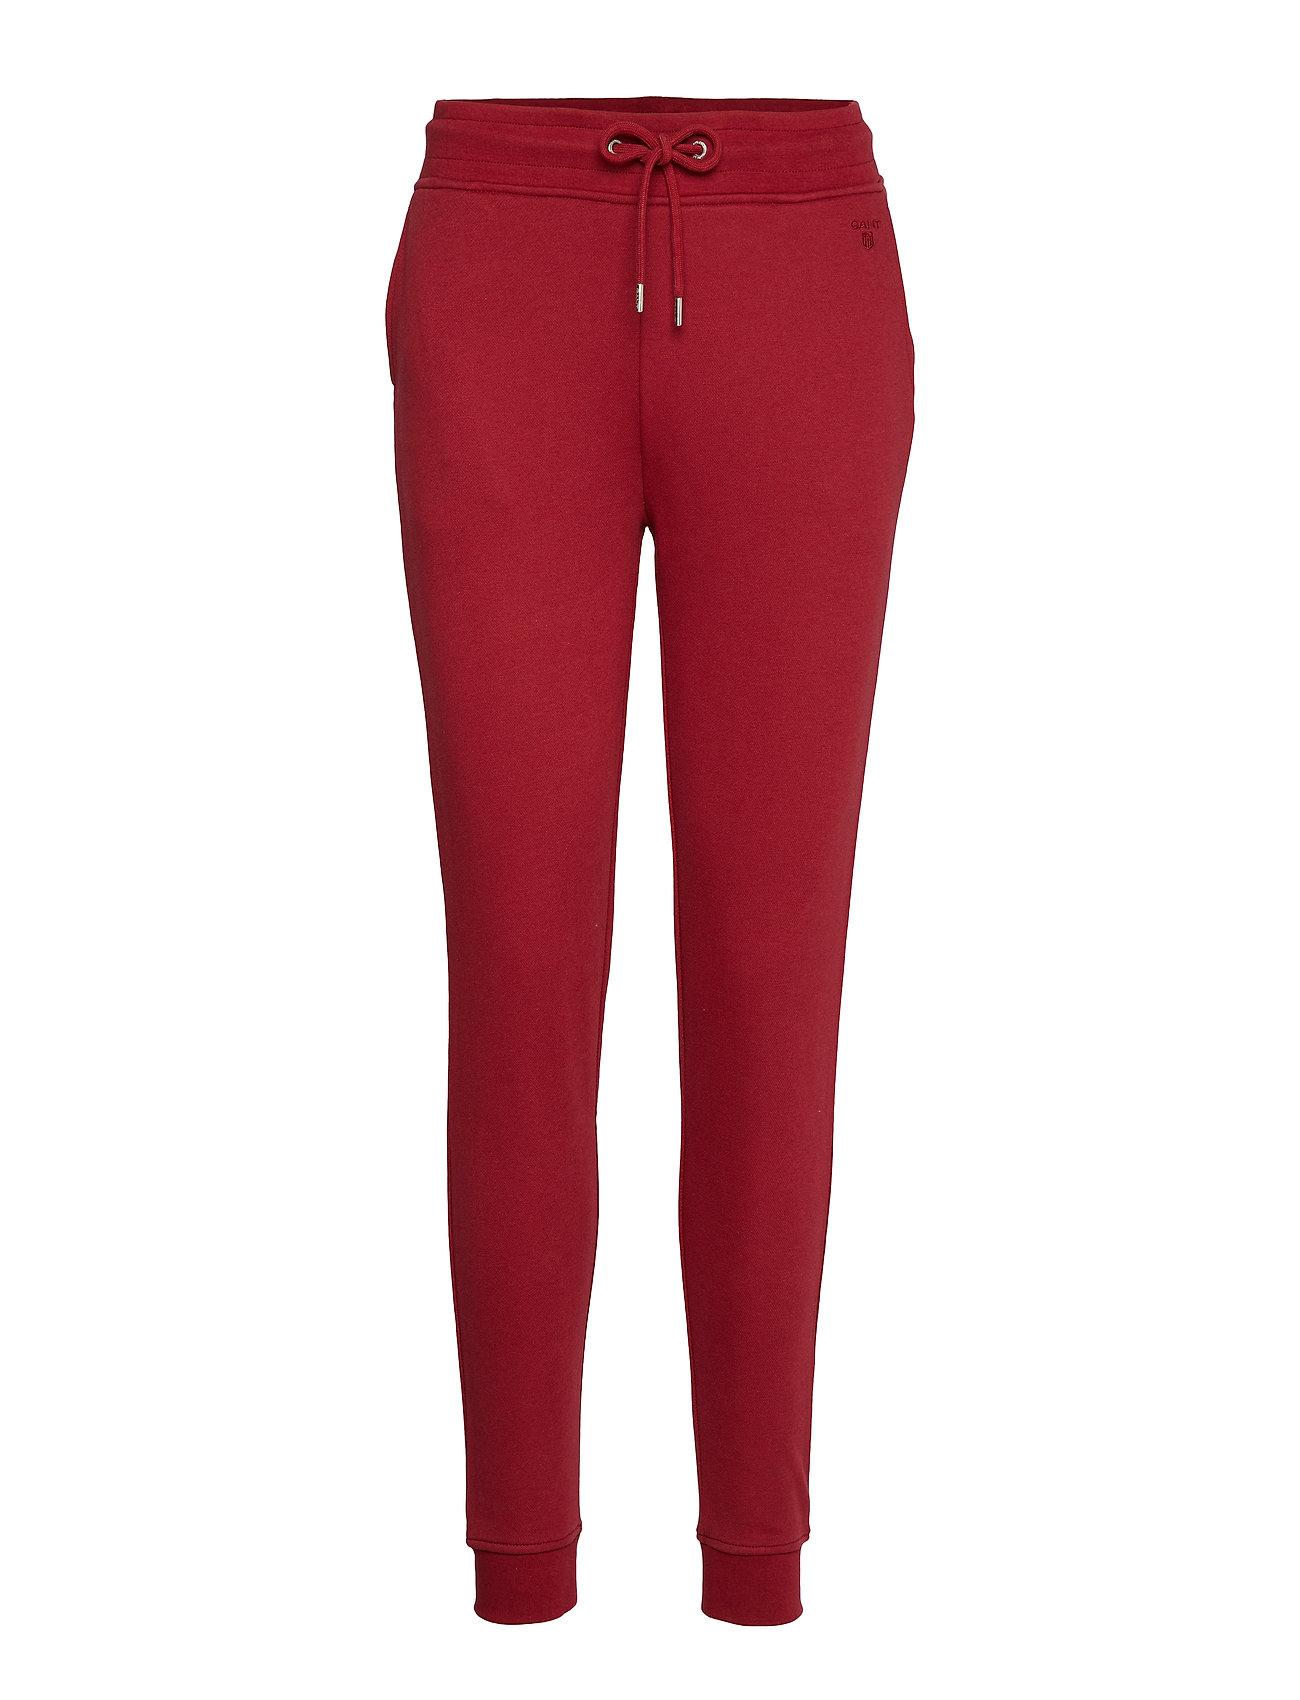 Gant TONAL SHIELD SWEAT PANTS - MAHOGNY RED